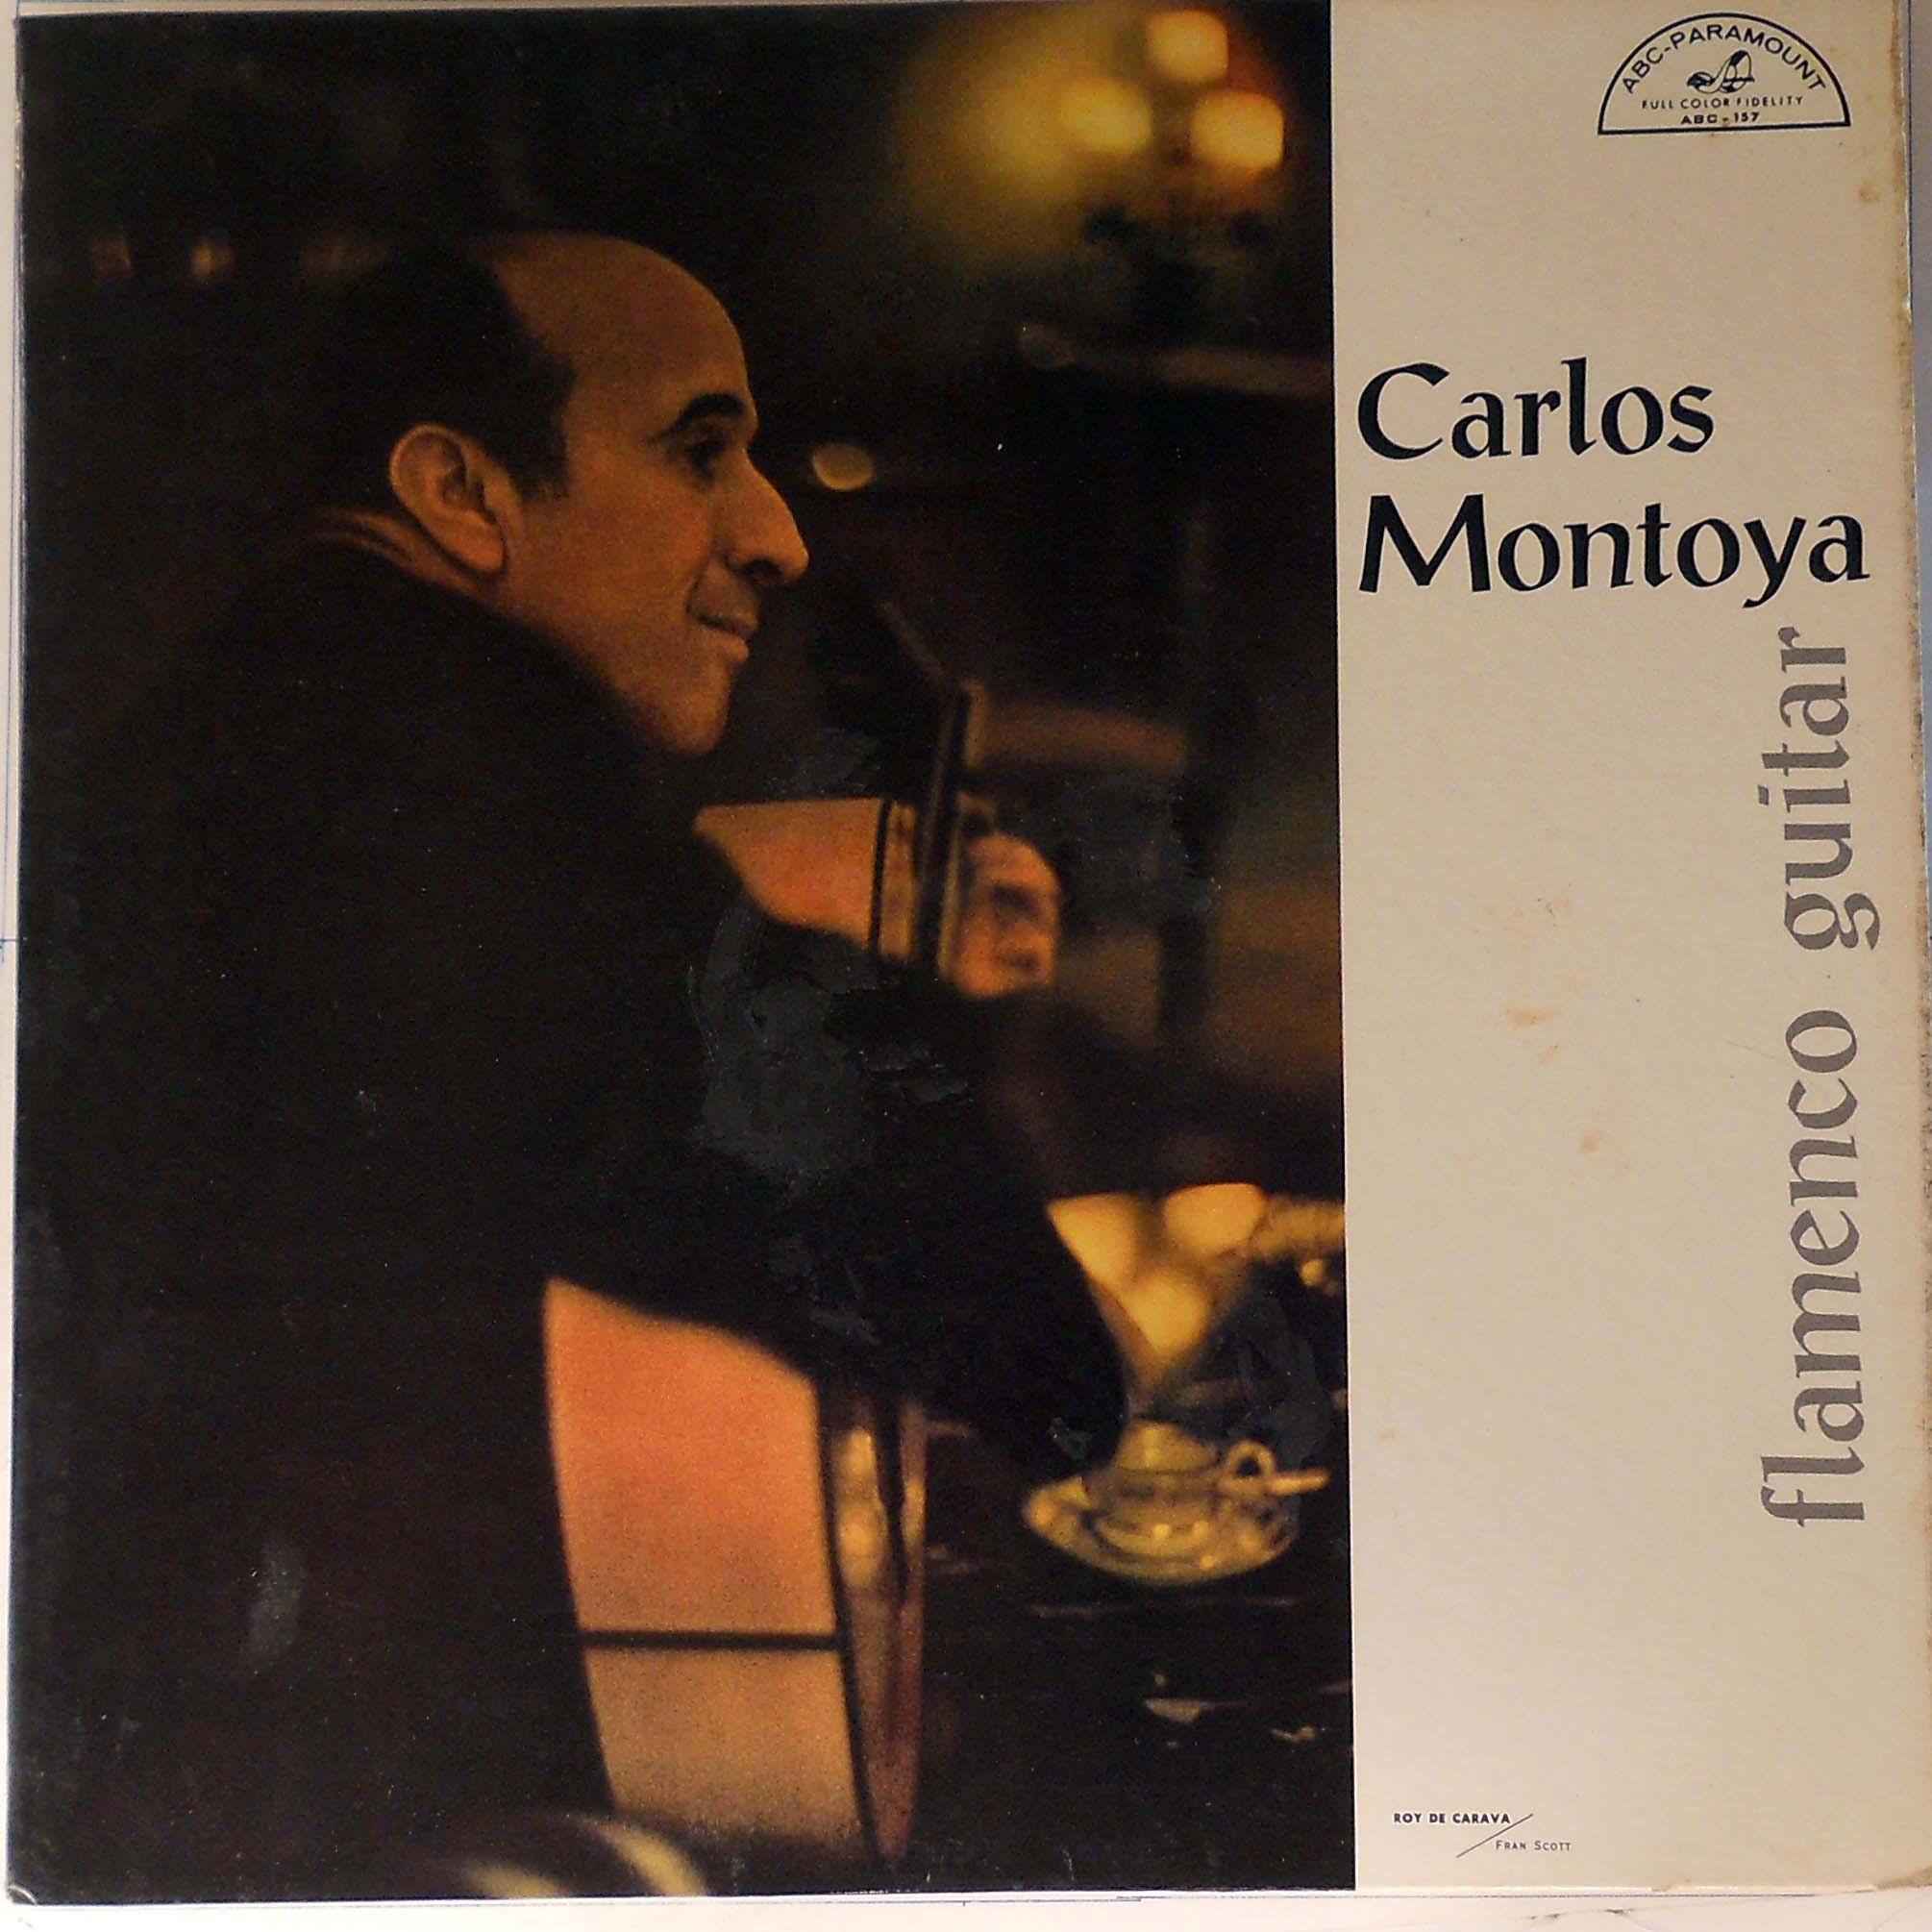 Carlos Montoya - Flamenco Guitar